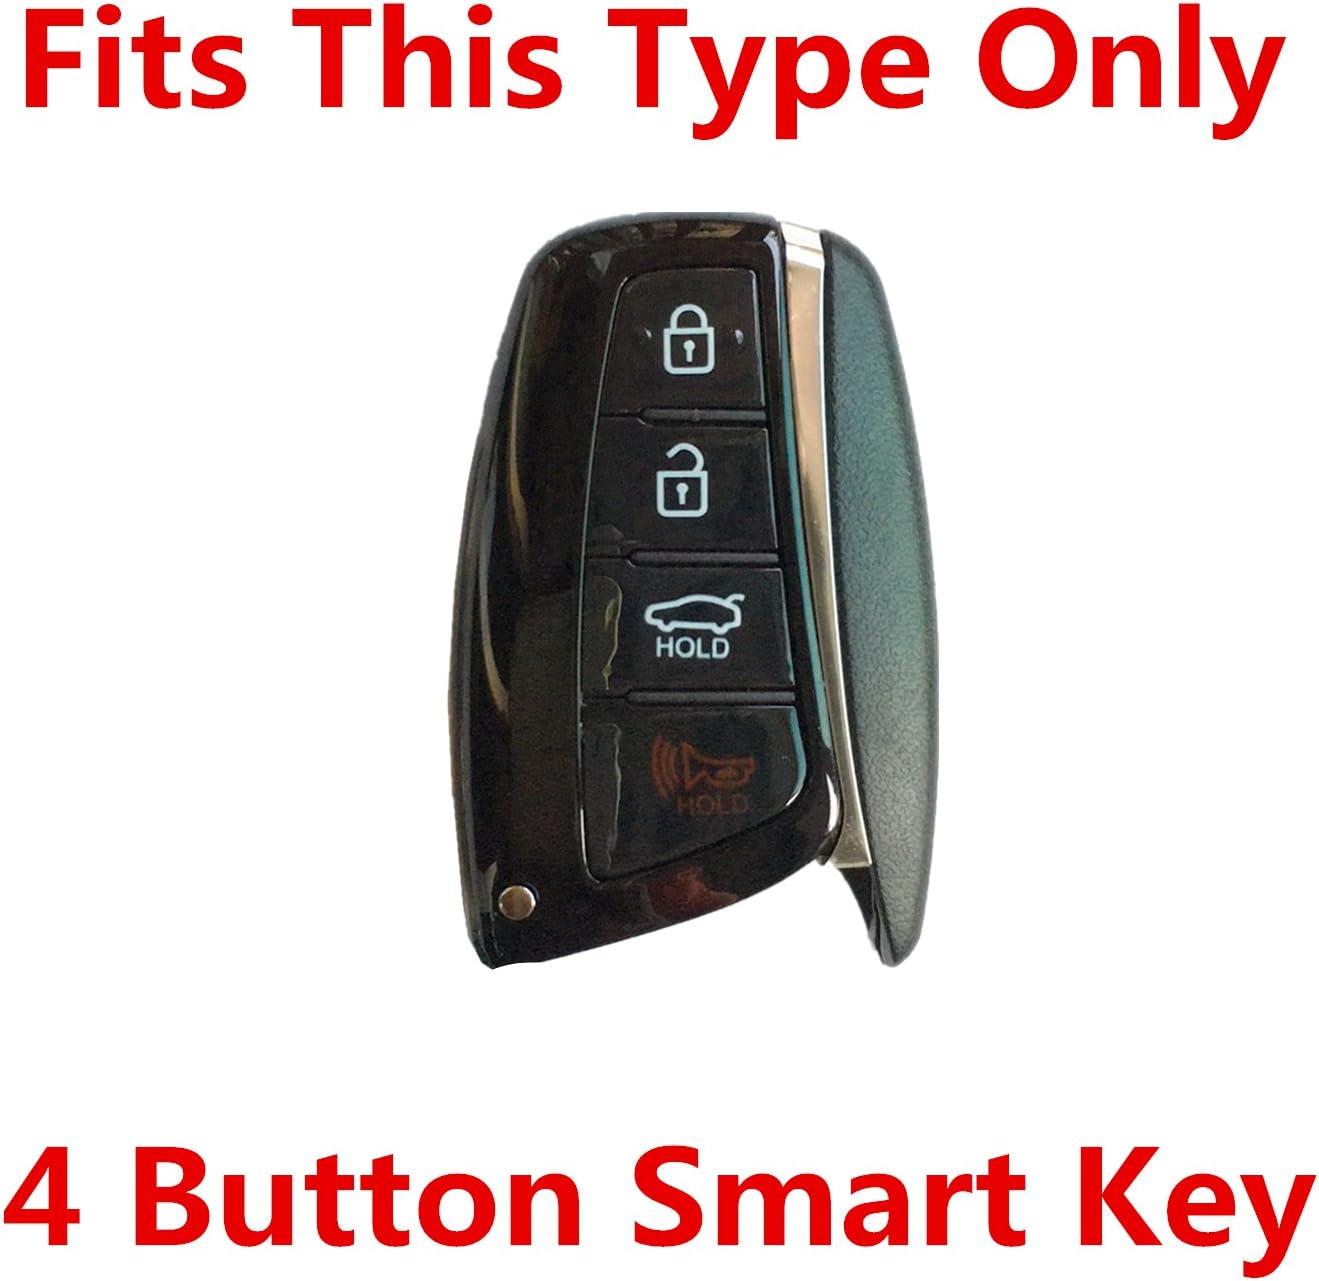 Rpkey Silicone Keyless Entry Remote Control Key Fob Cover Case protector For 2015 2016 Hyundai Genesis 2013 2014 2015 Santa Fe 2014 2015 Equus 2015 Azera SY5DMFNA433 SY5DMFNA04 95440-4Z200